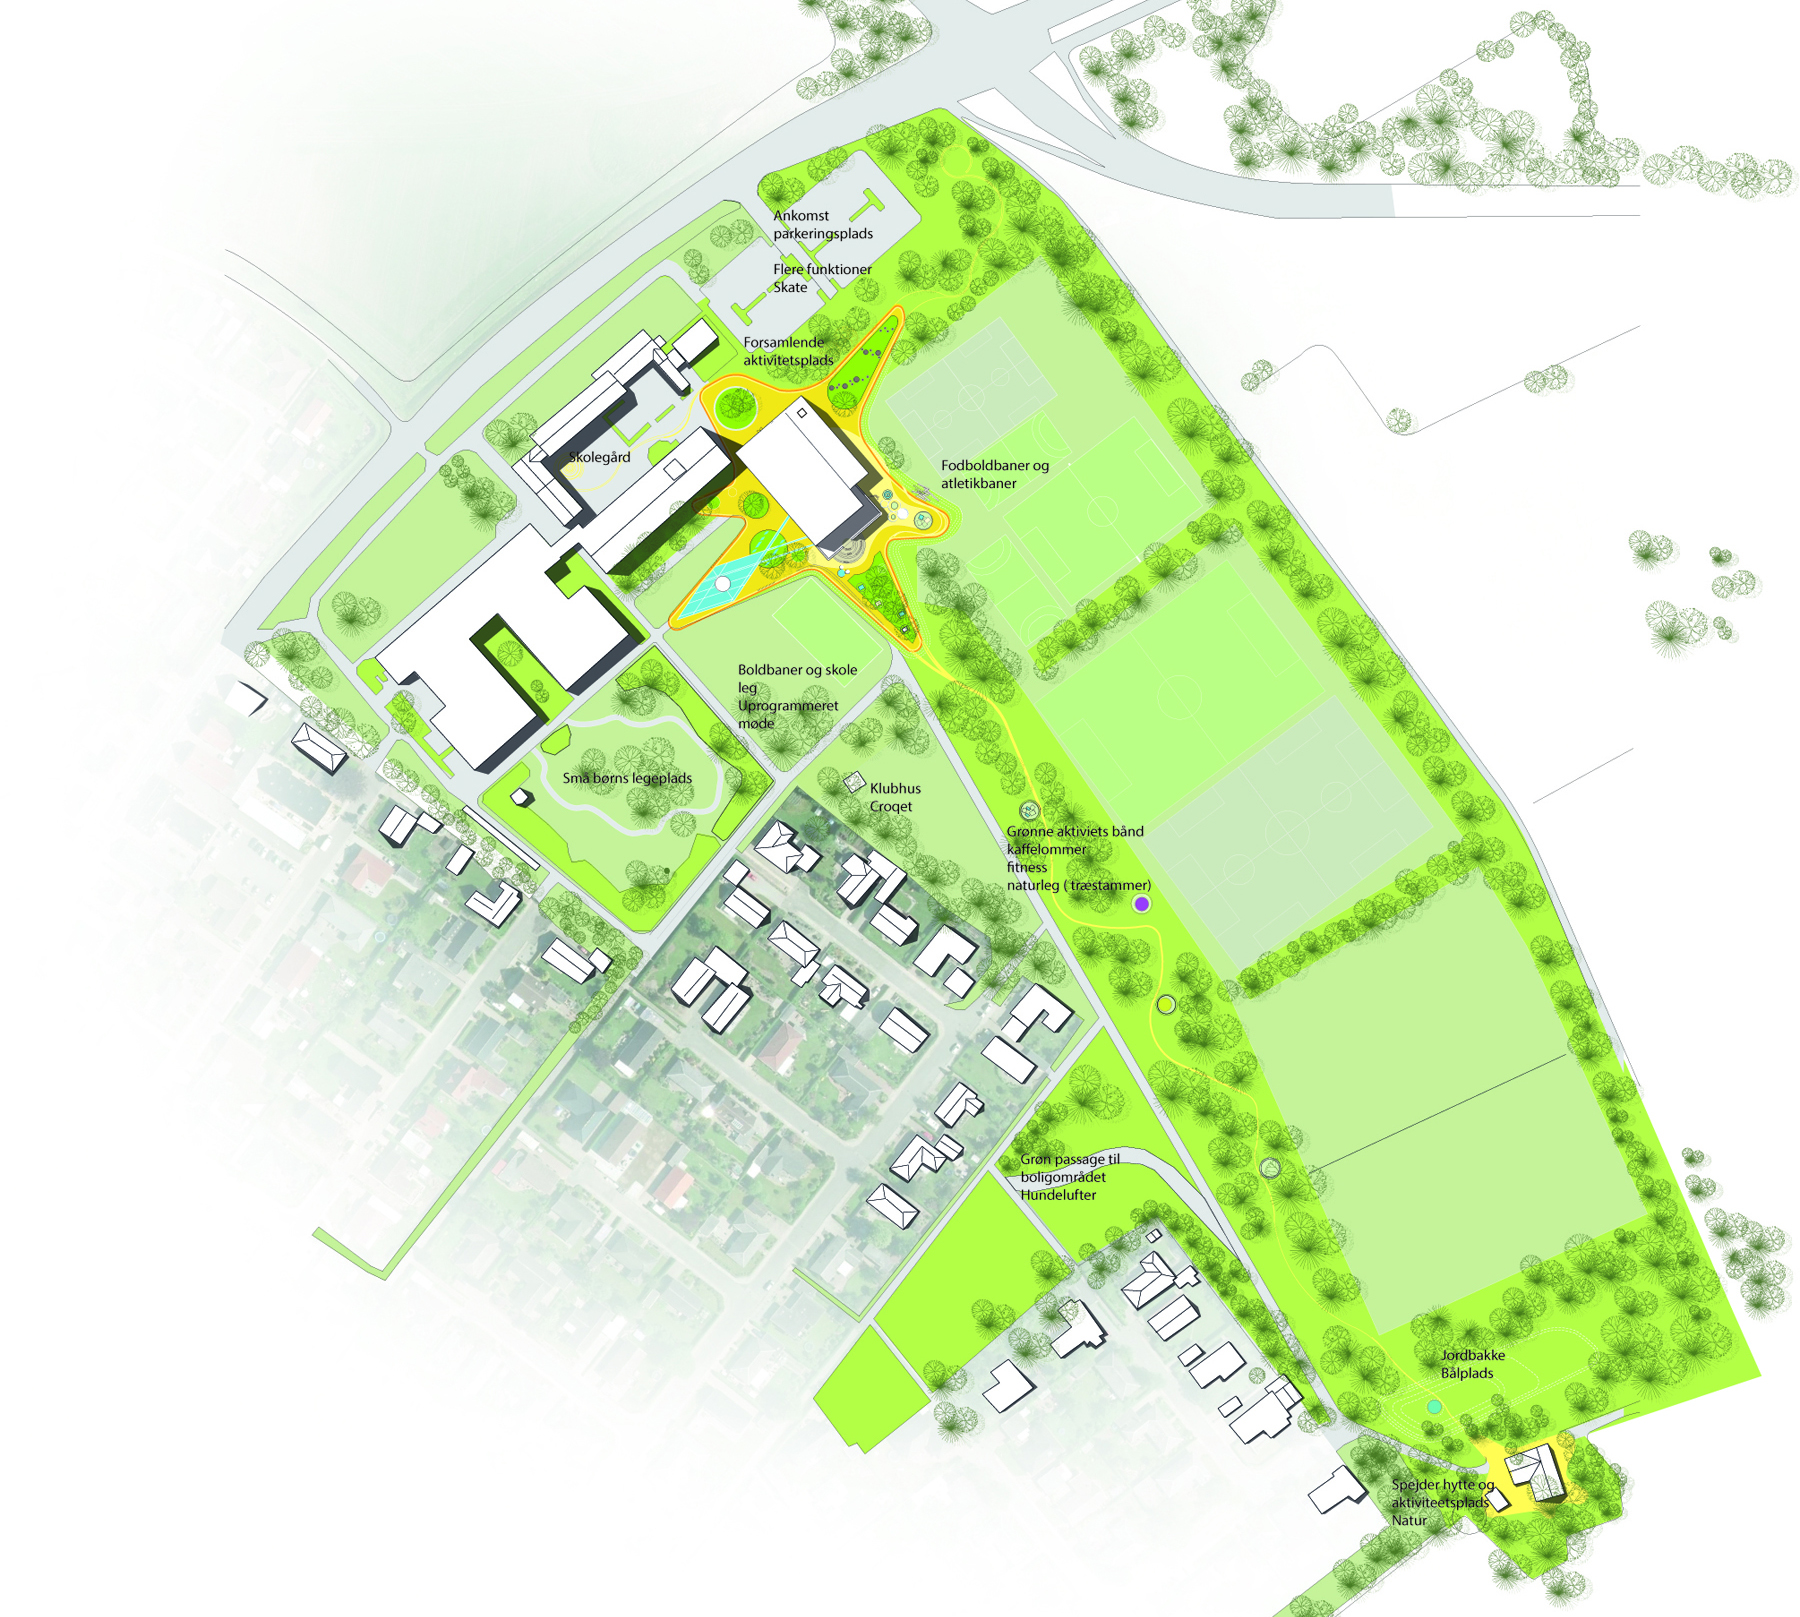 Plan*: URBANlab nordic